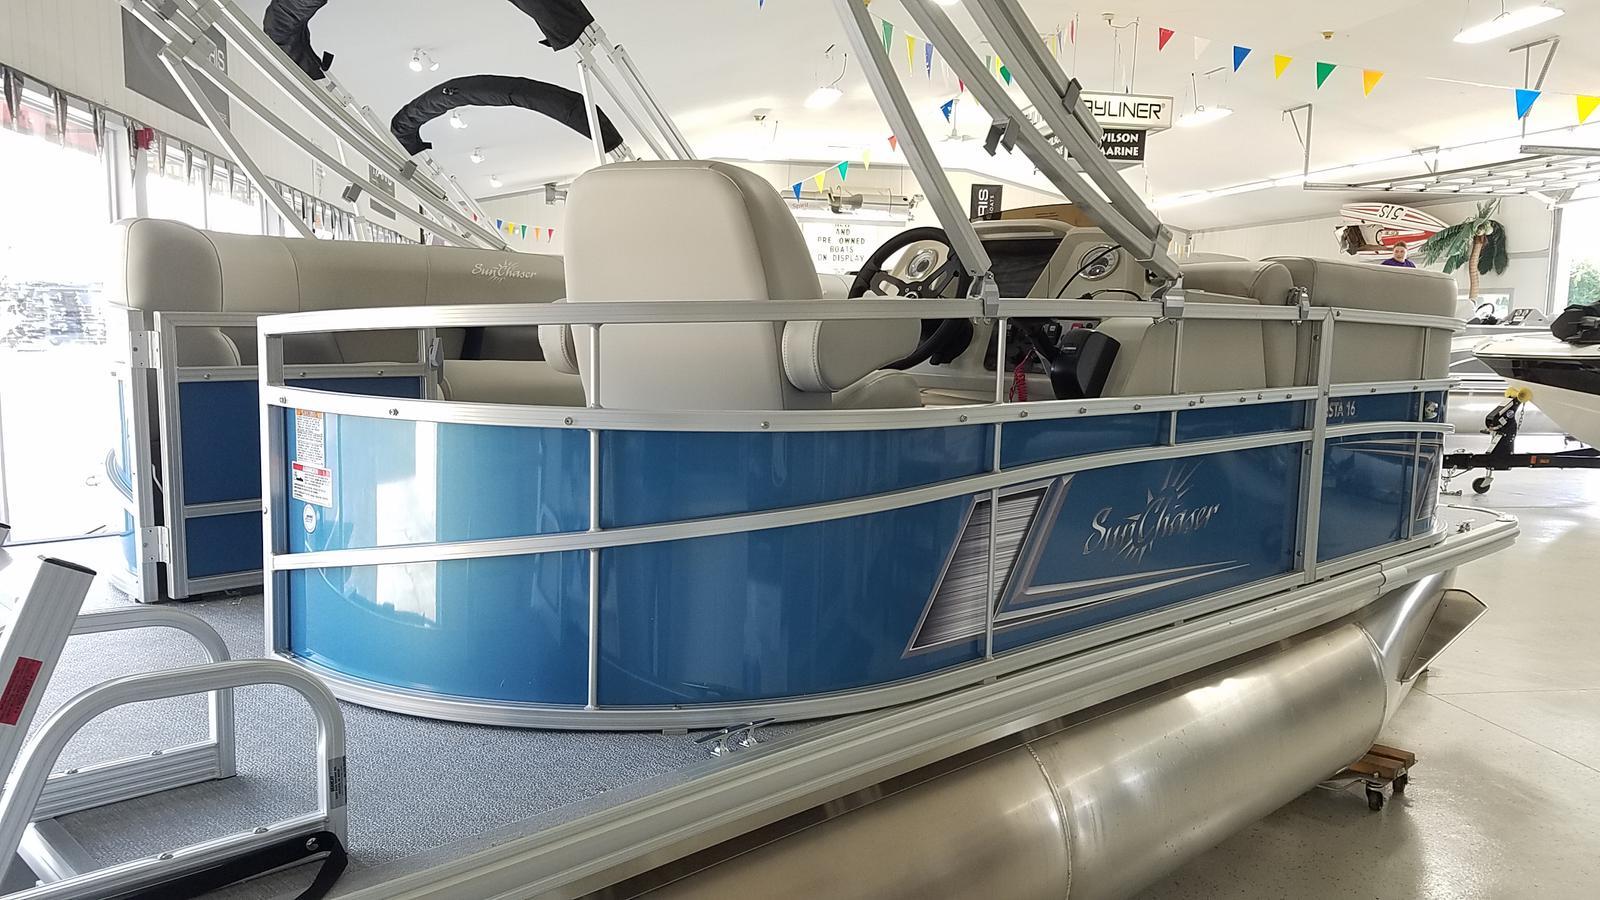 2021 SunChaser boat for sale, model of the boat is Vista 16 LR & Image # 2 of 16